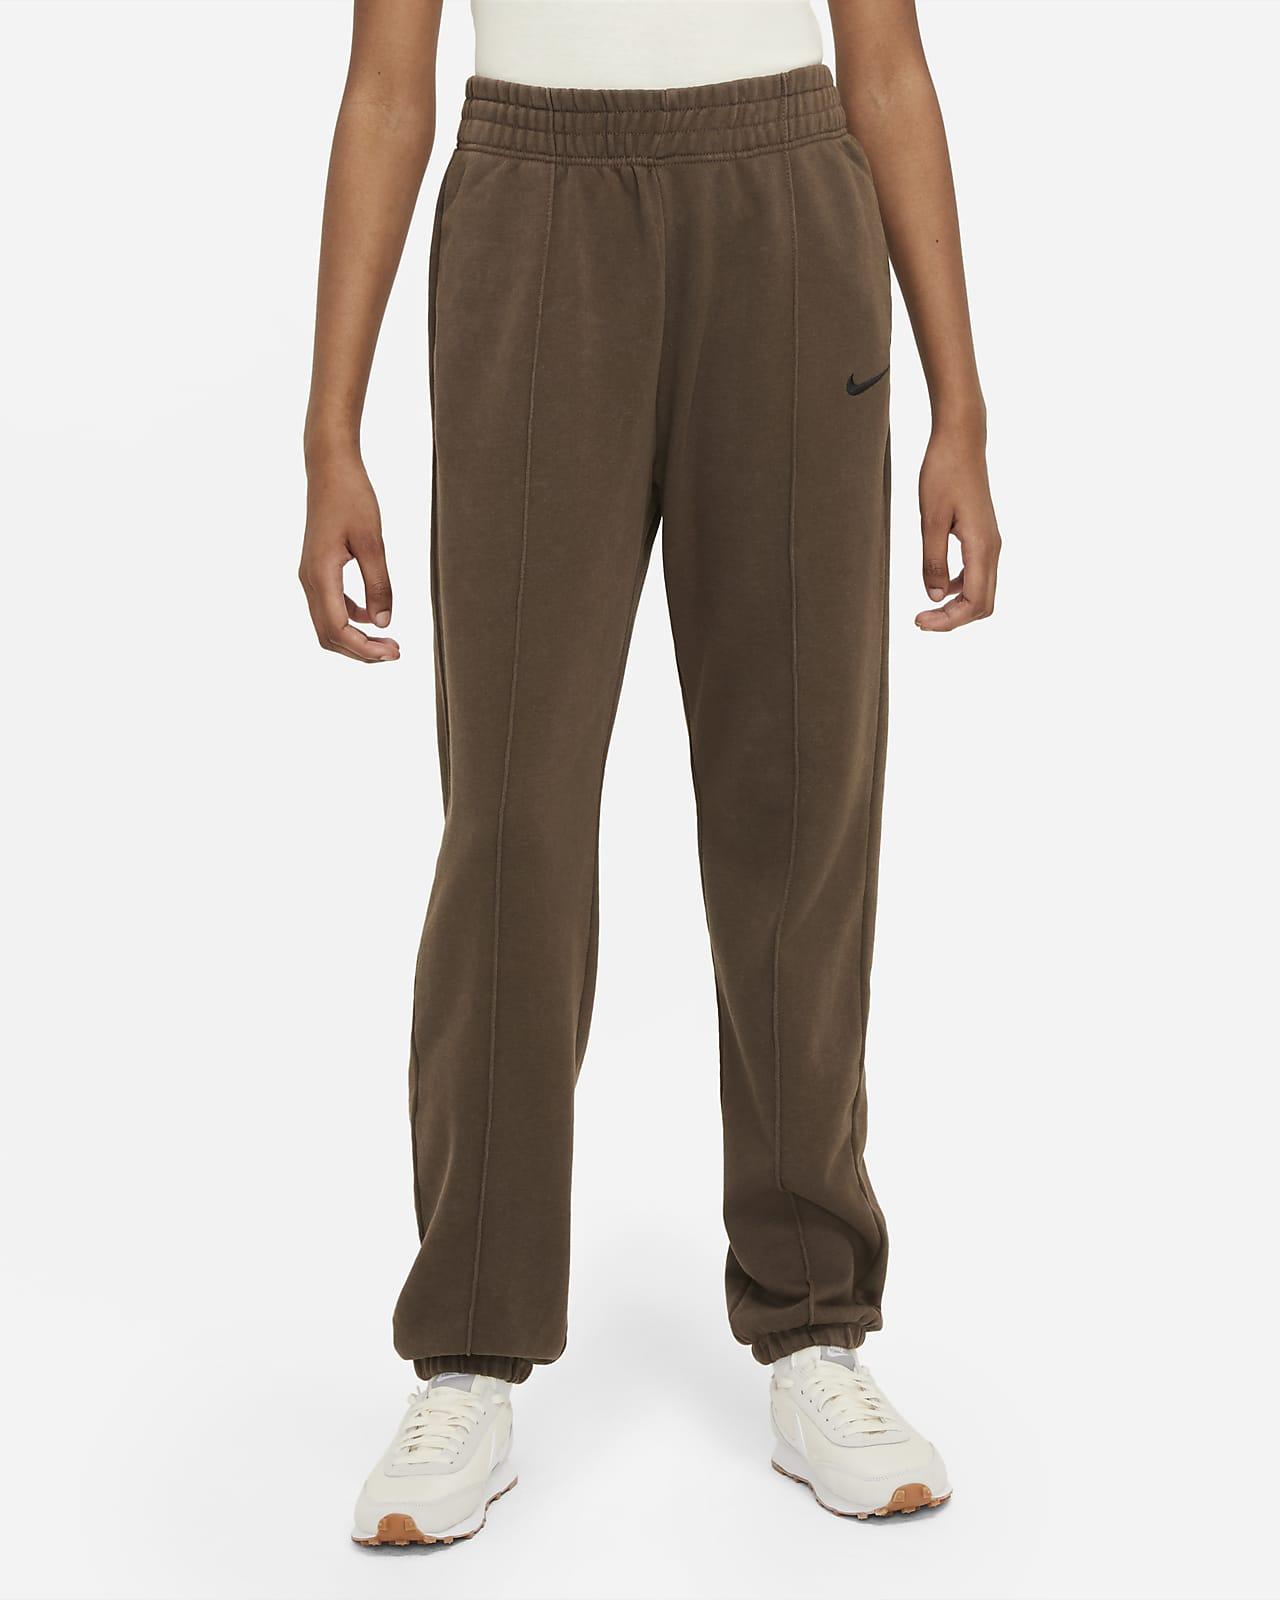 Nike Sportswear Essential Collection Women's Washed Fleece Trousers